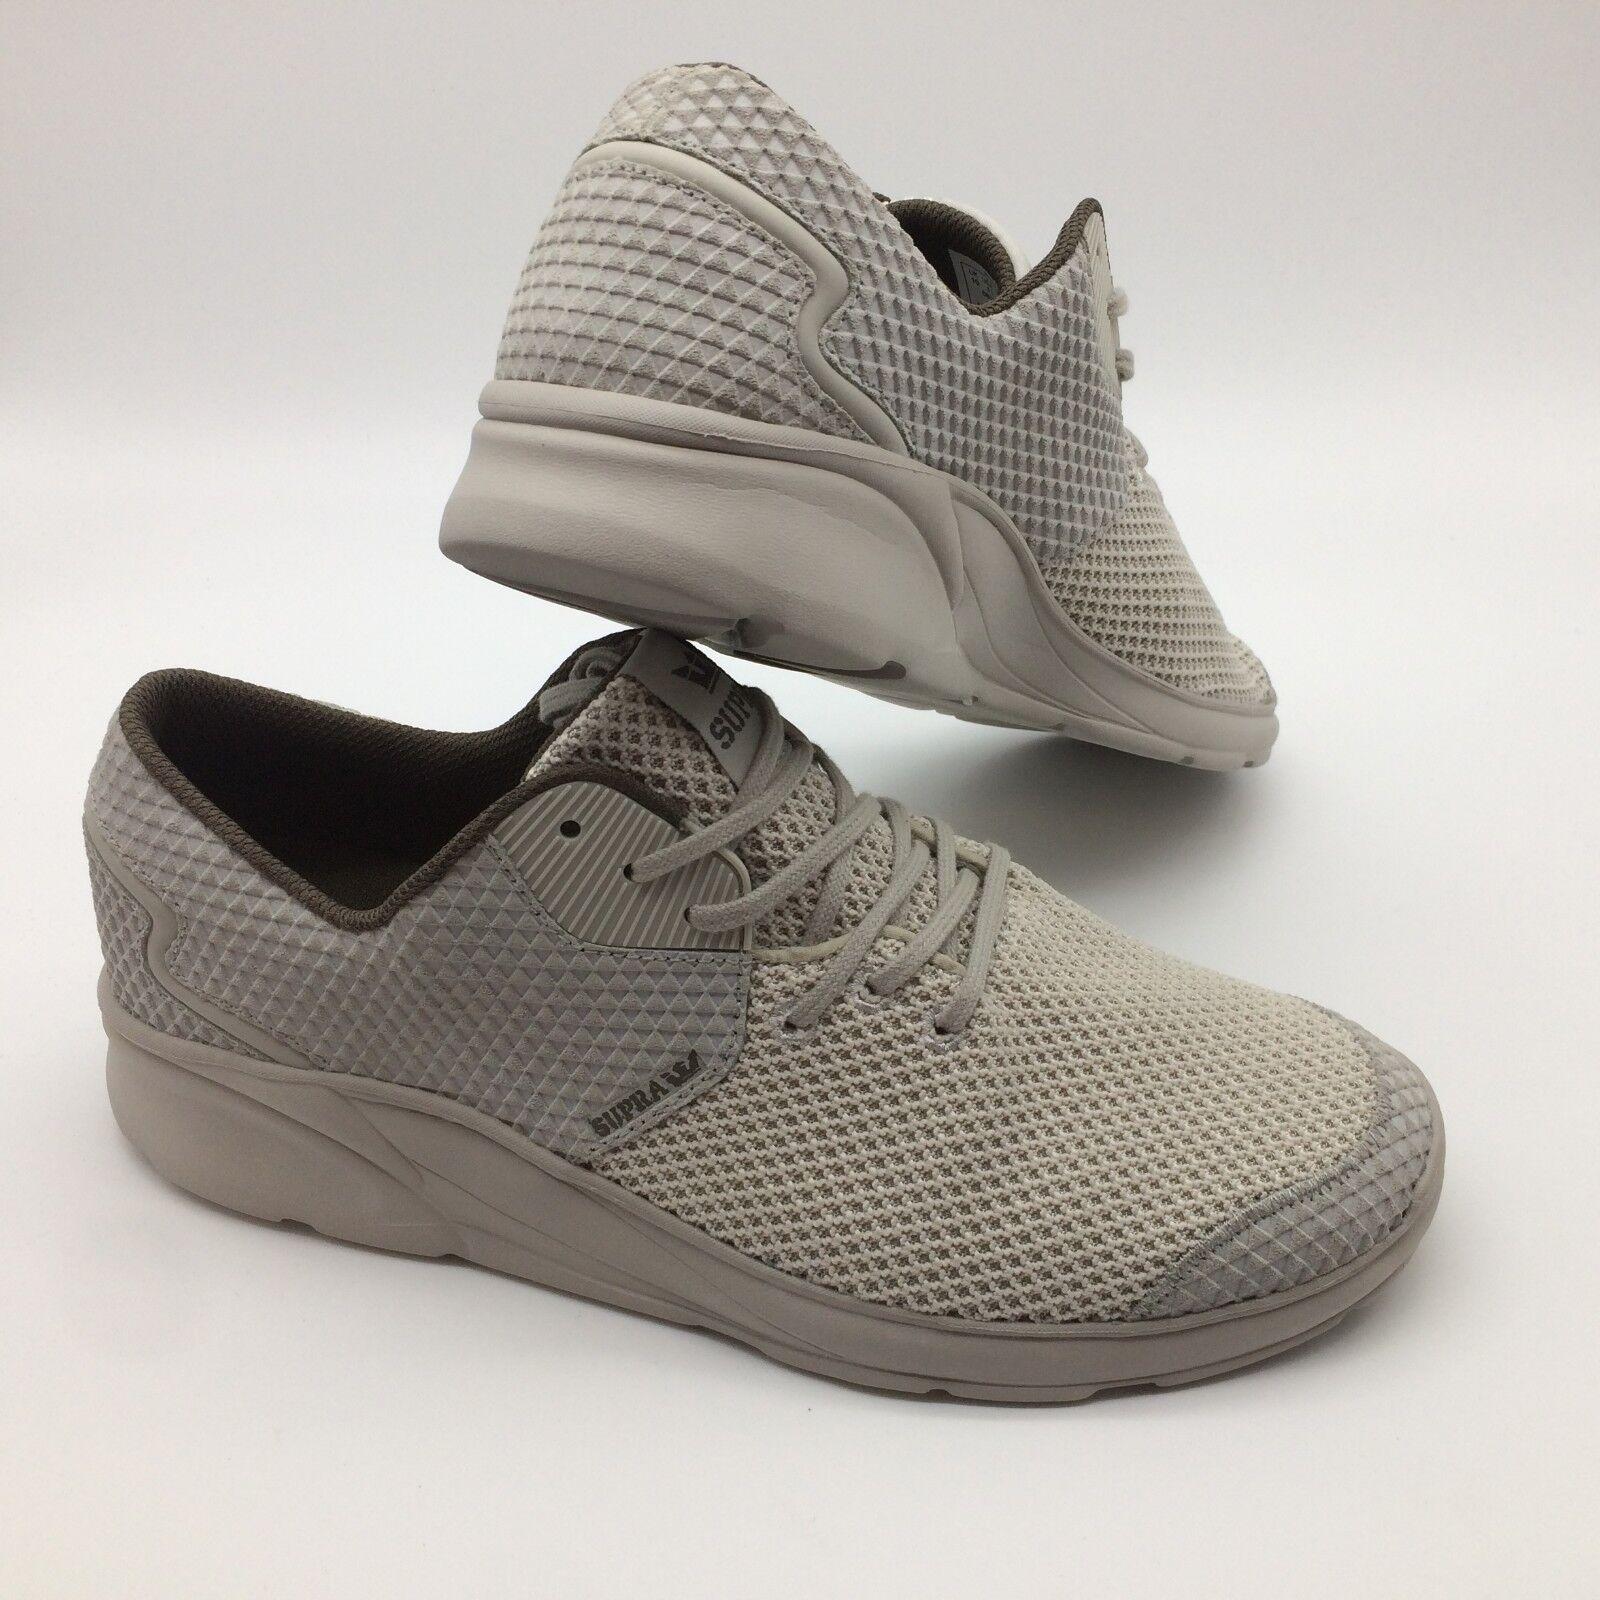 Supra Men's shoes ''NOIZ  LT GREY